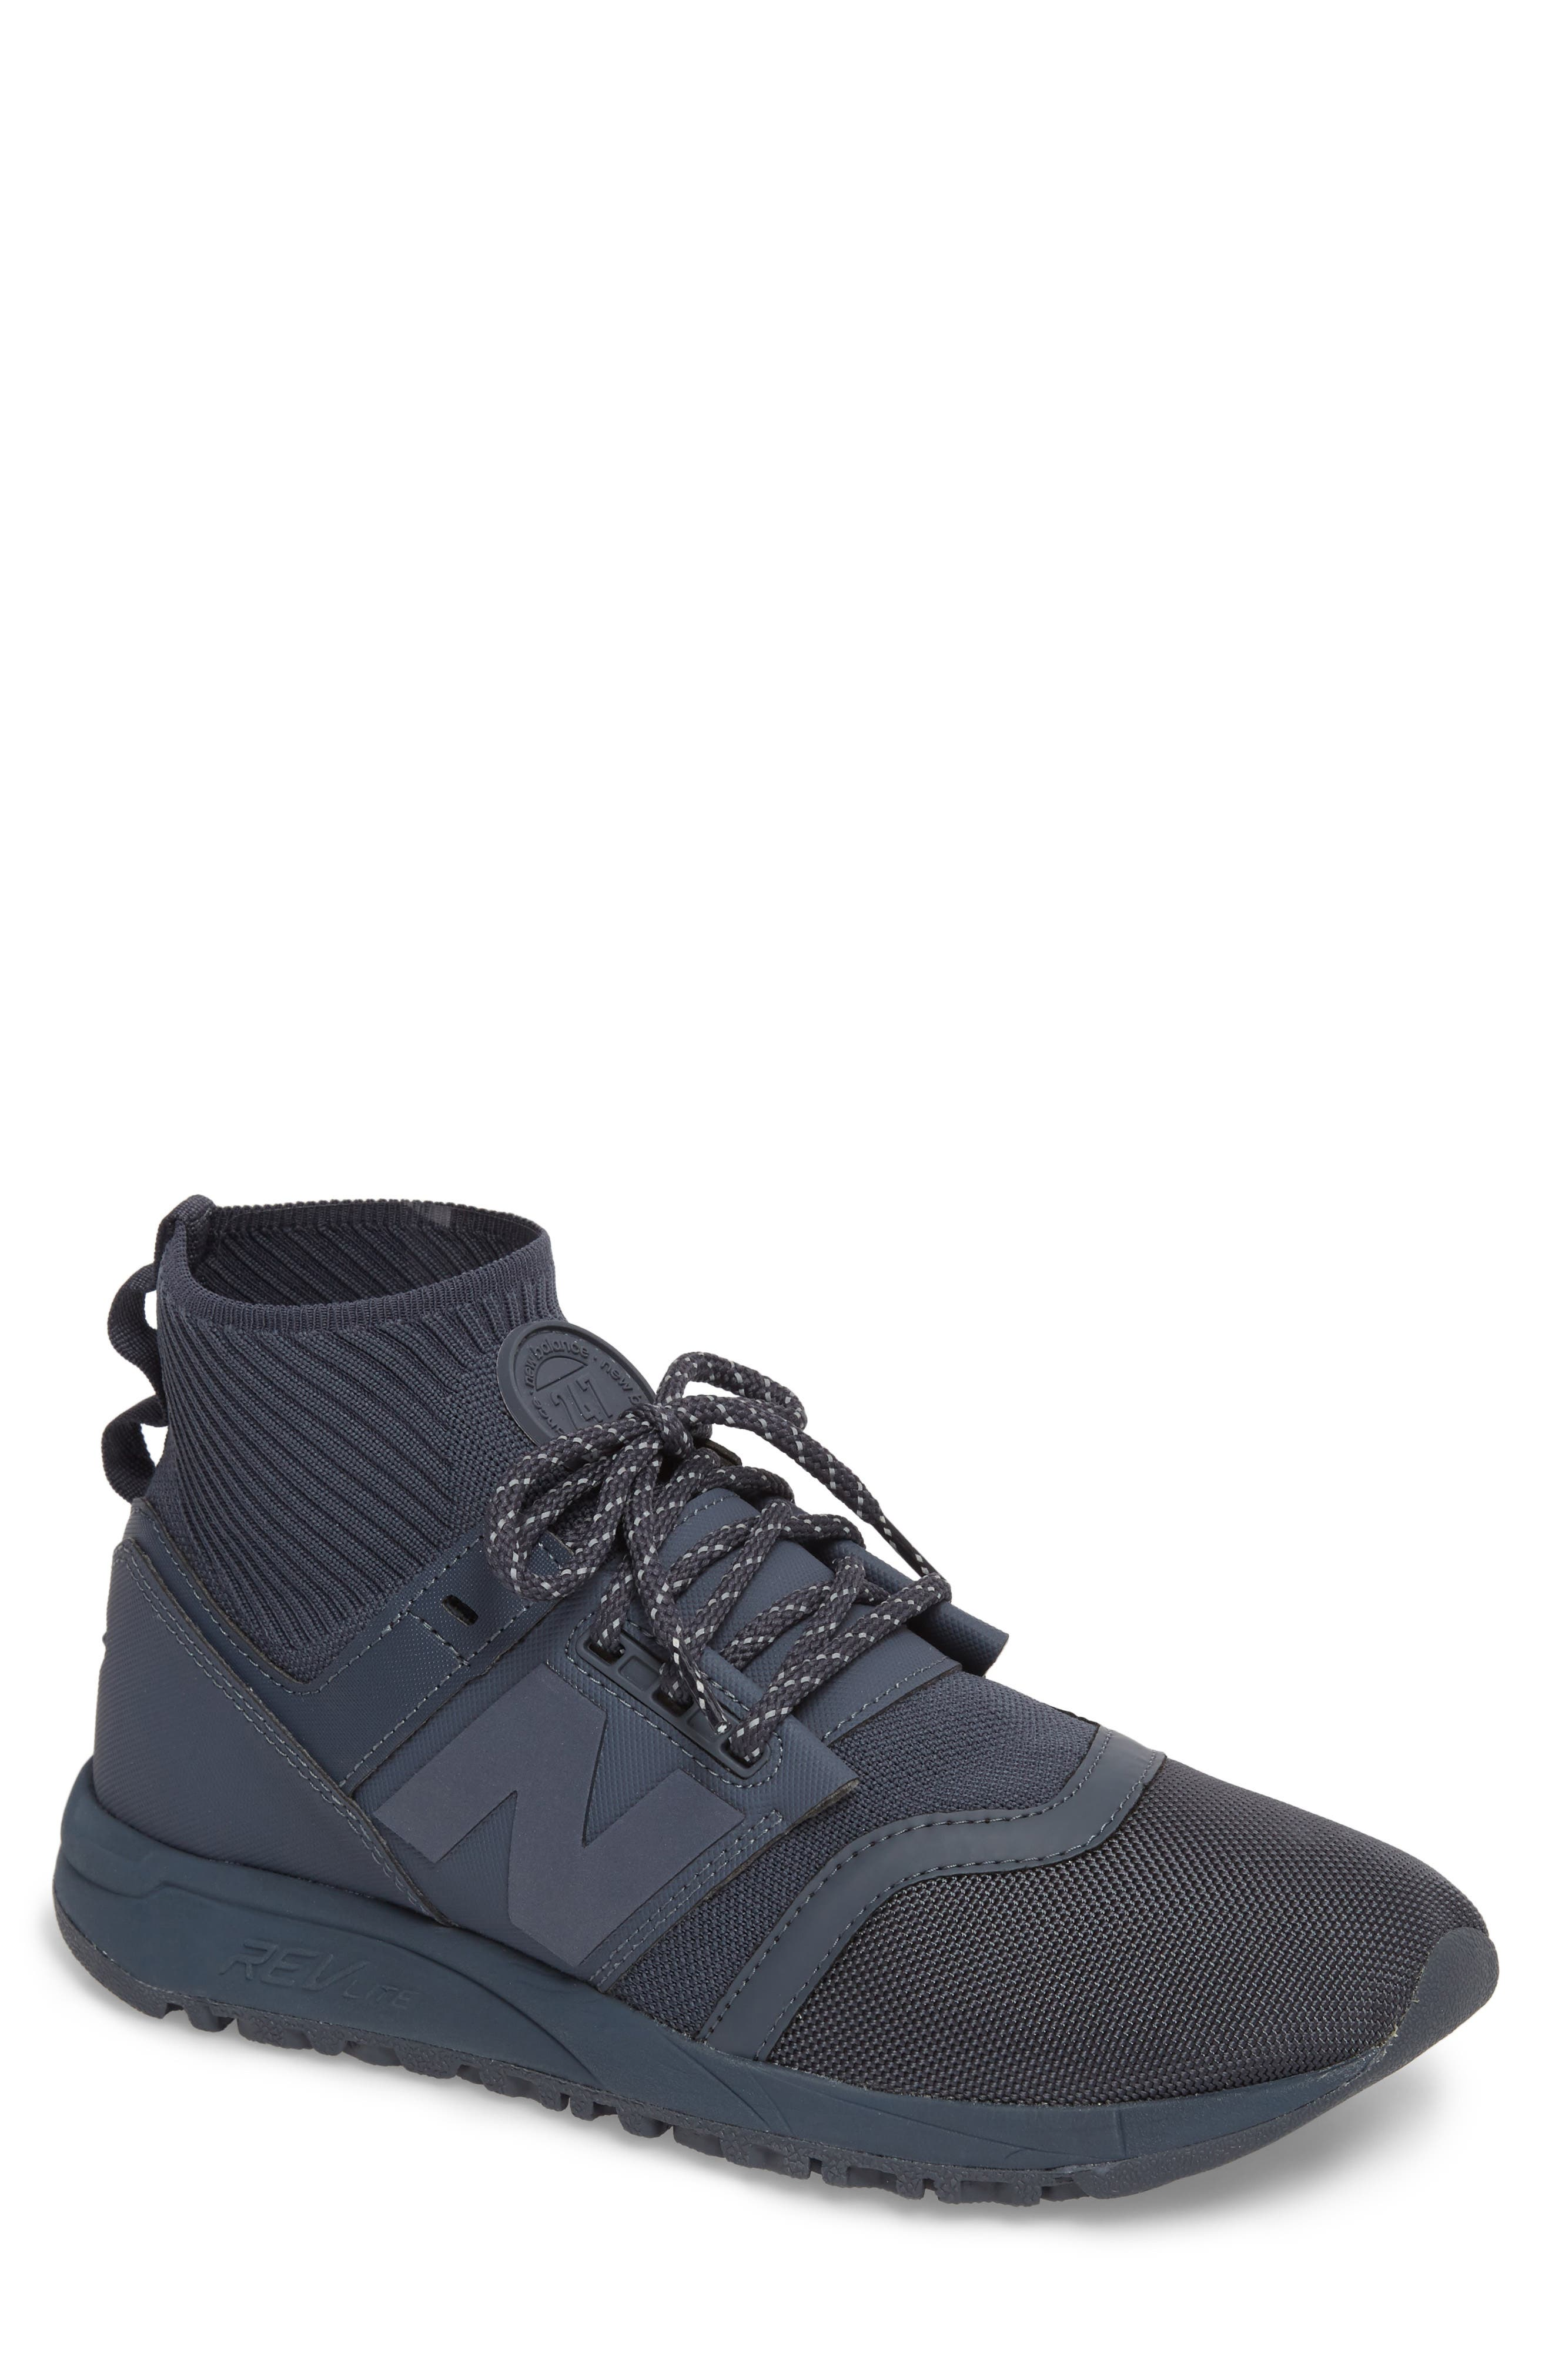 New Balance 247 Mid Sneaker (Men)